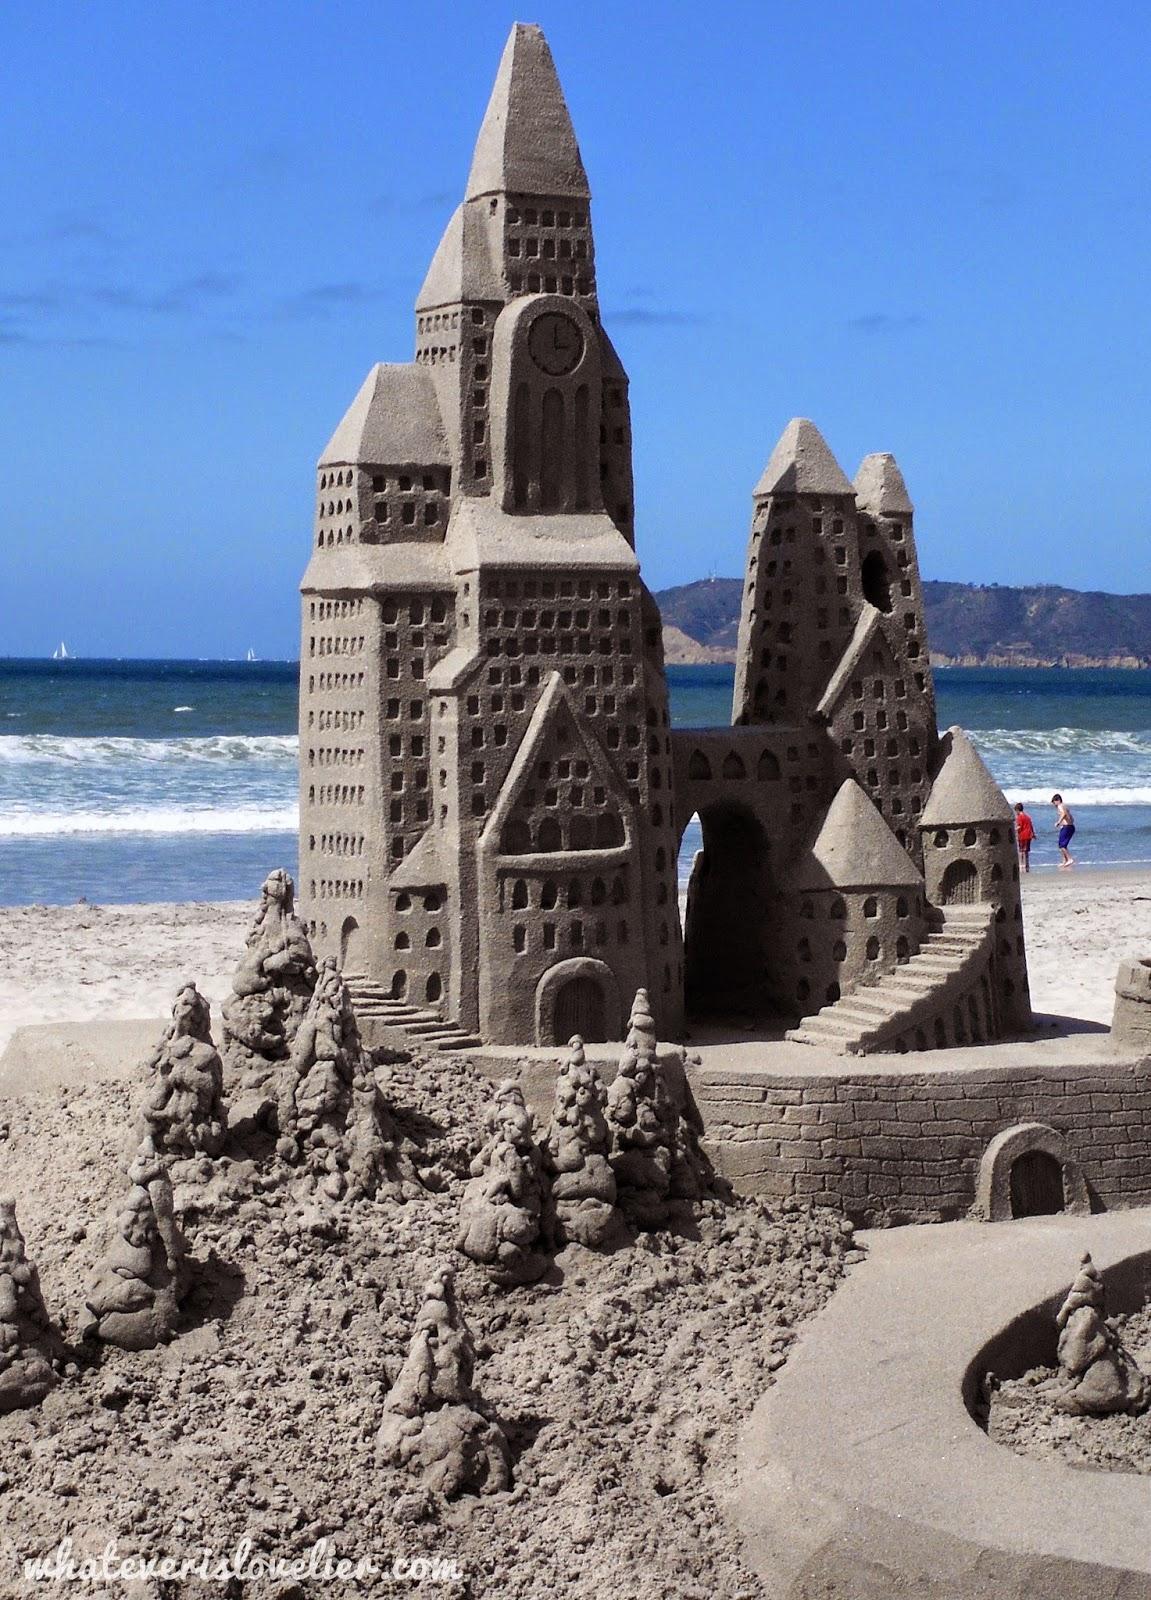 Travel Tuesday: Hotel Del Coronado, San Diego